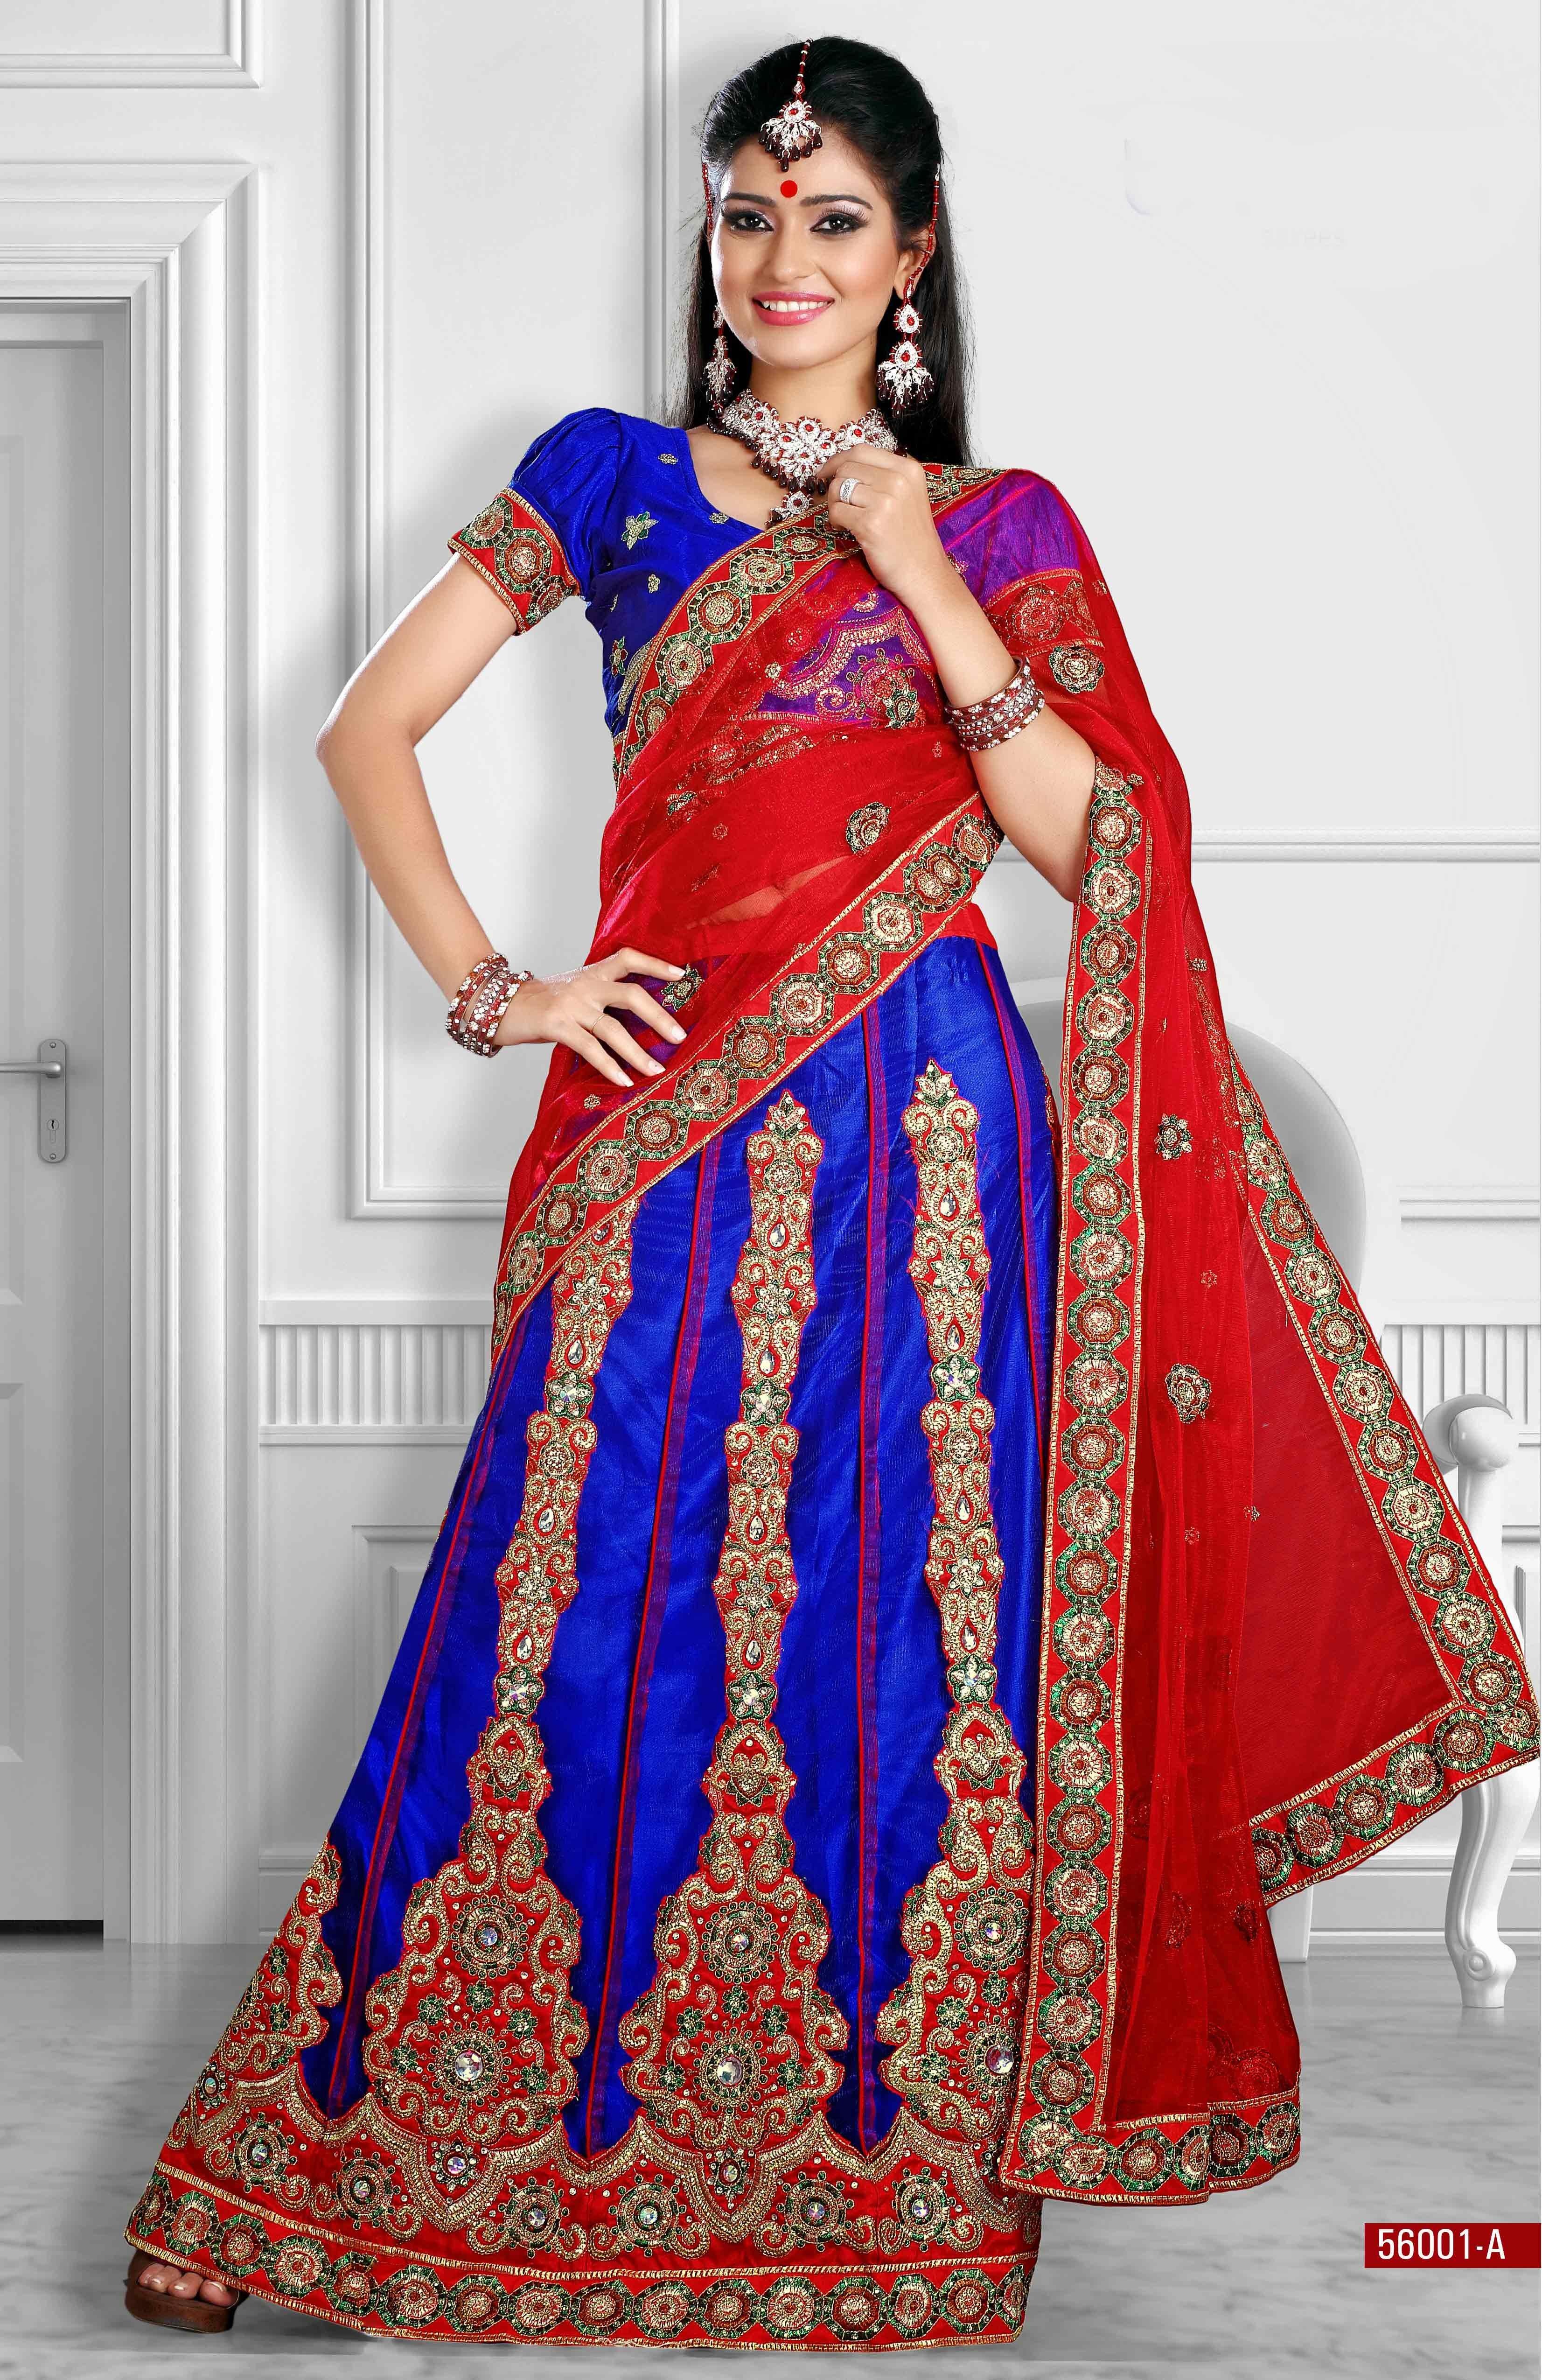 Hindu Womens Dress : Popular Orange Hindu Womens Dress ...